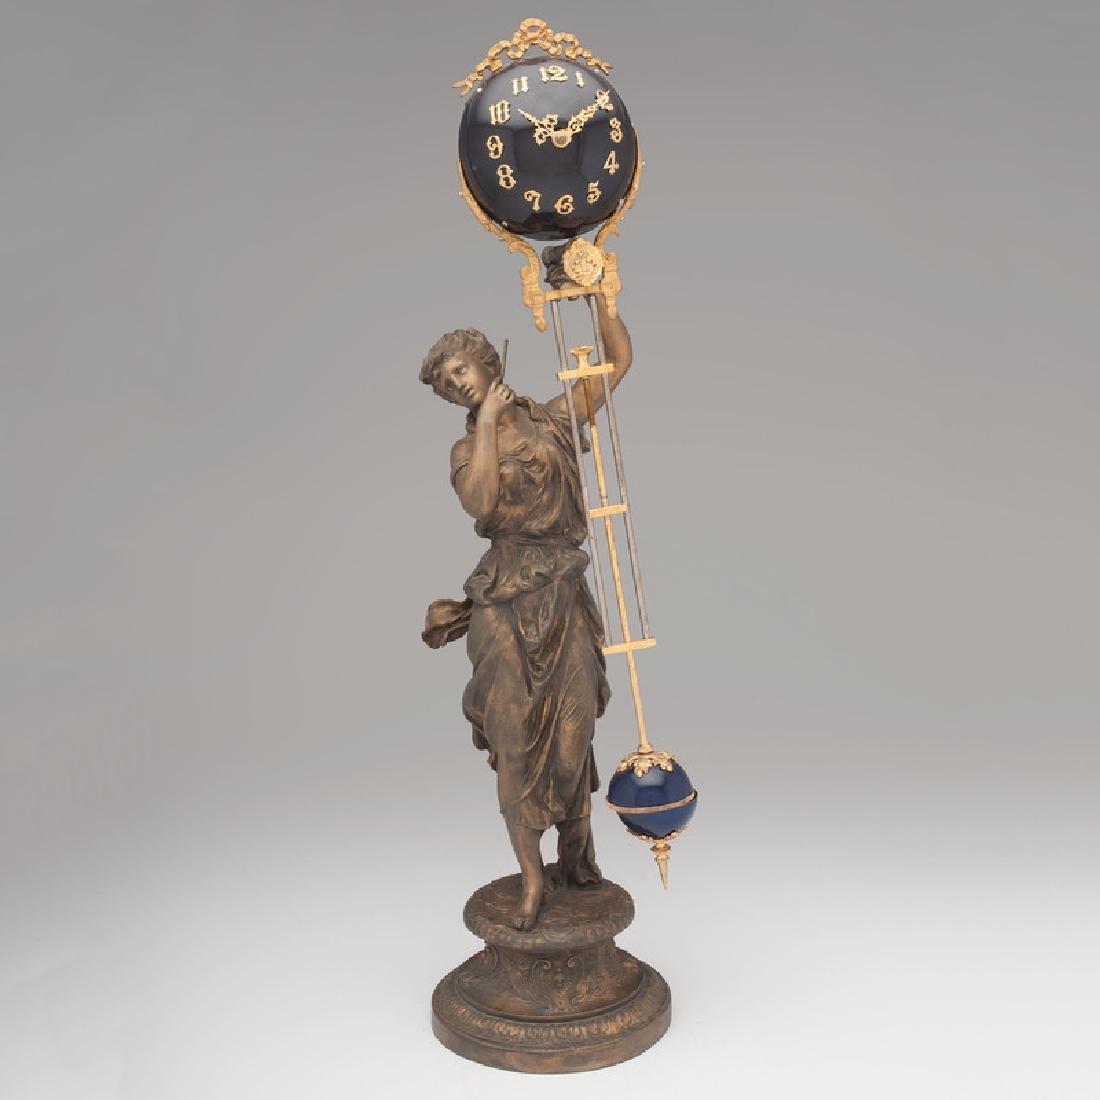 Ansonia Swing Clock, Juno